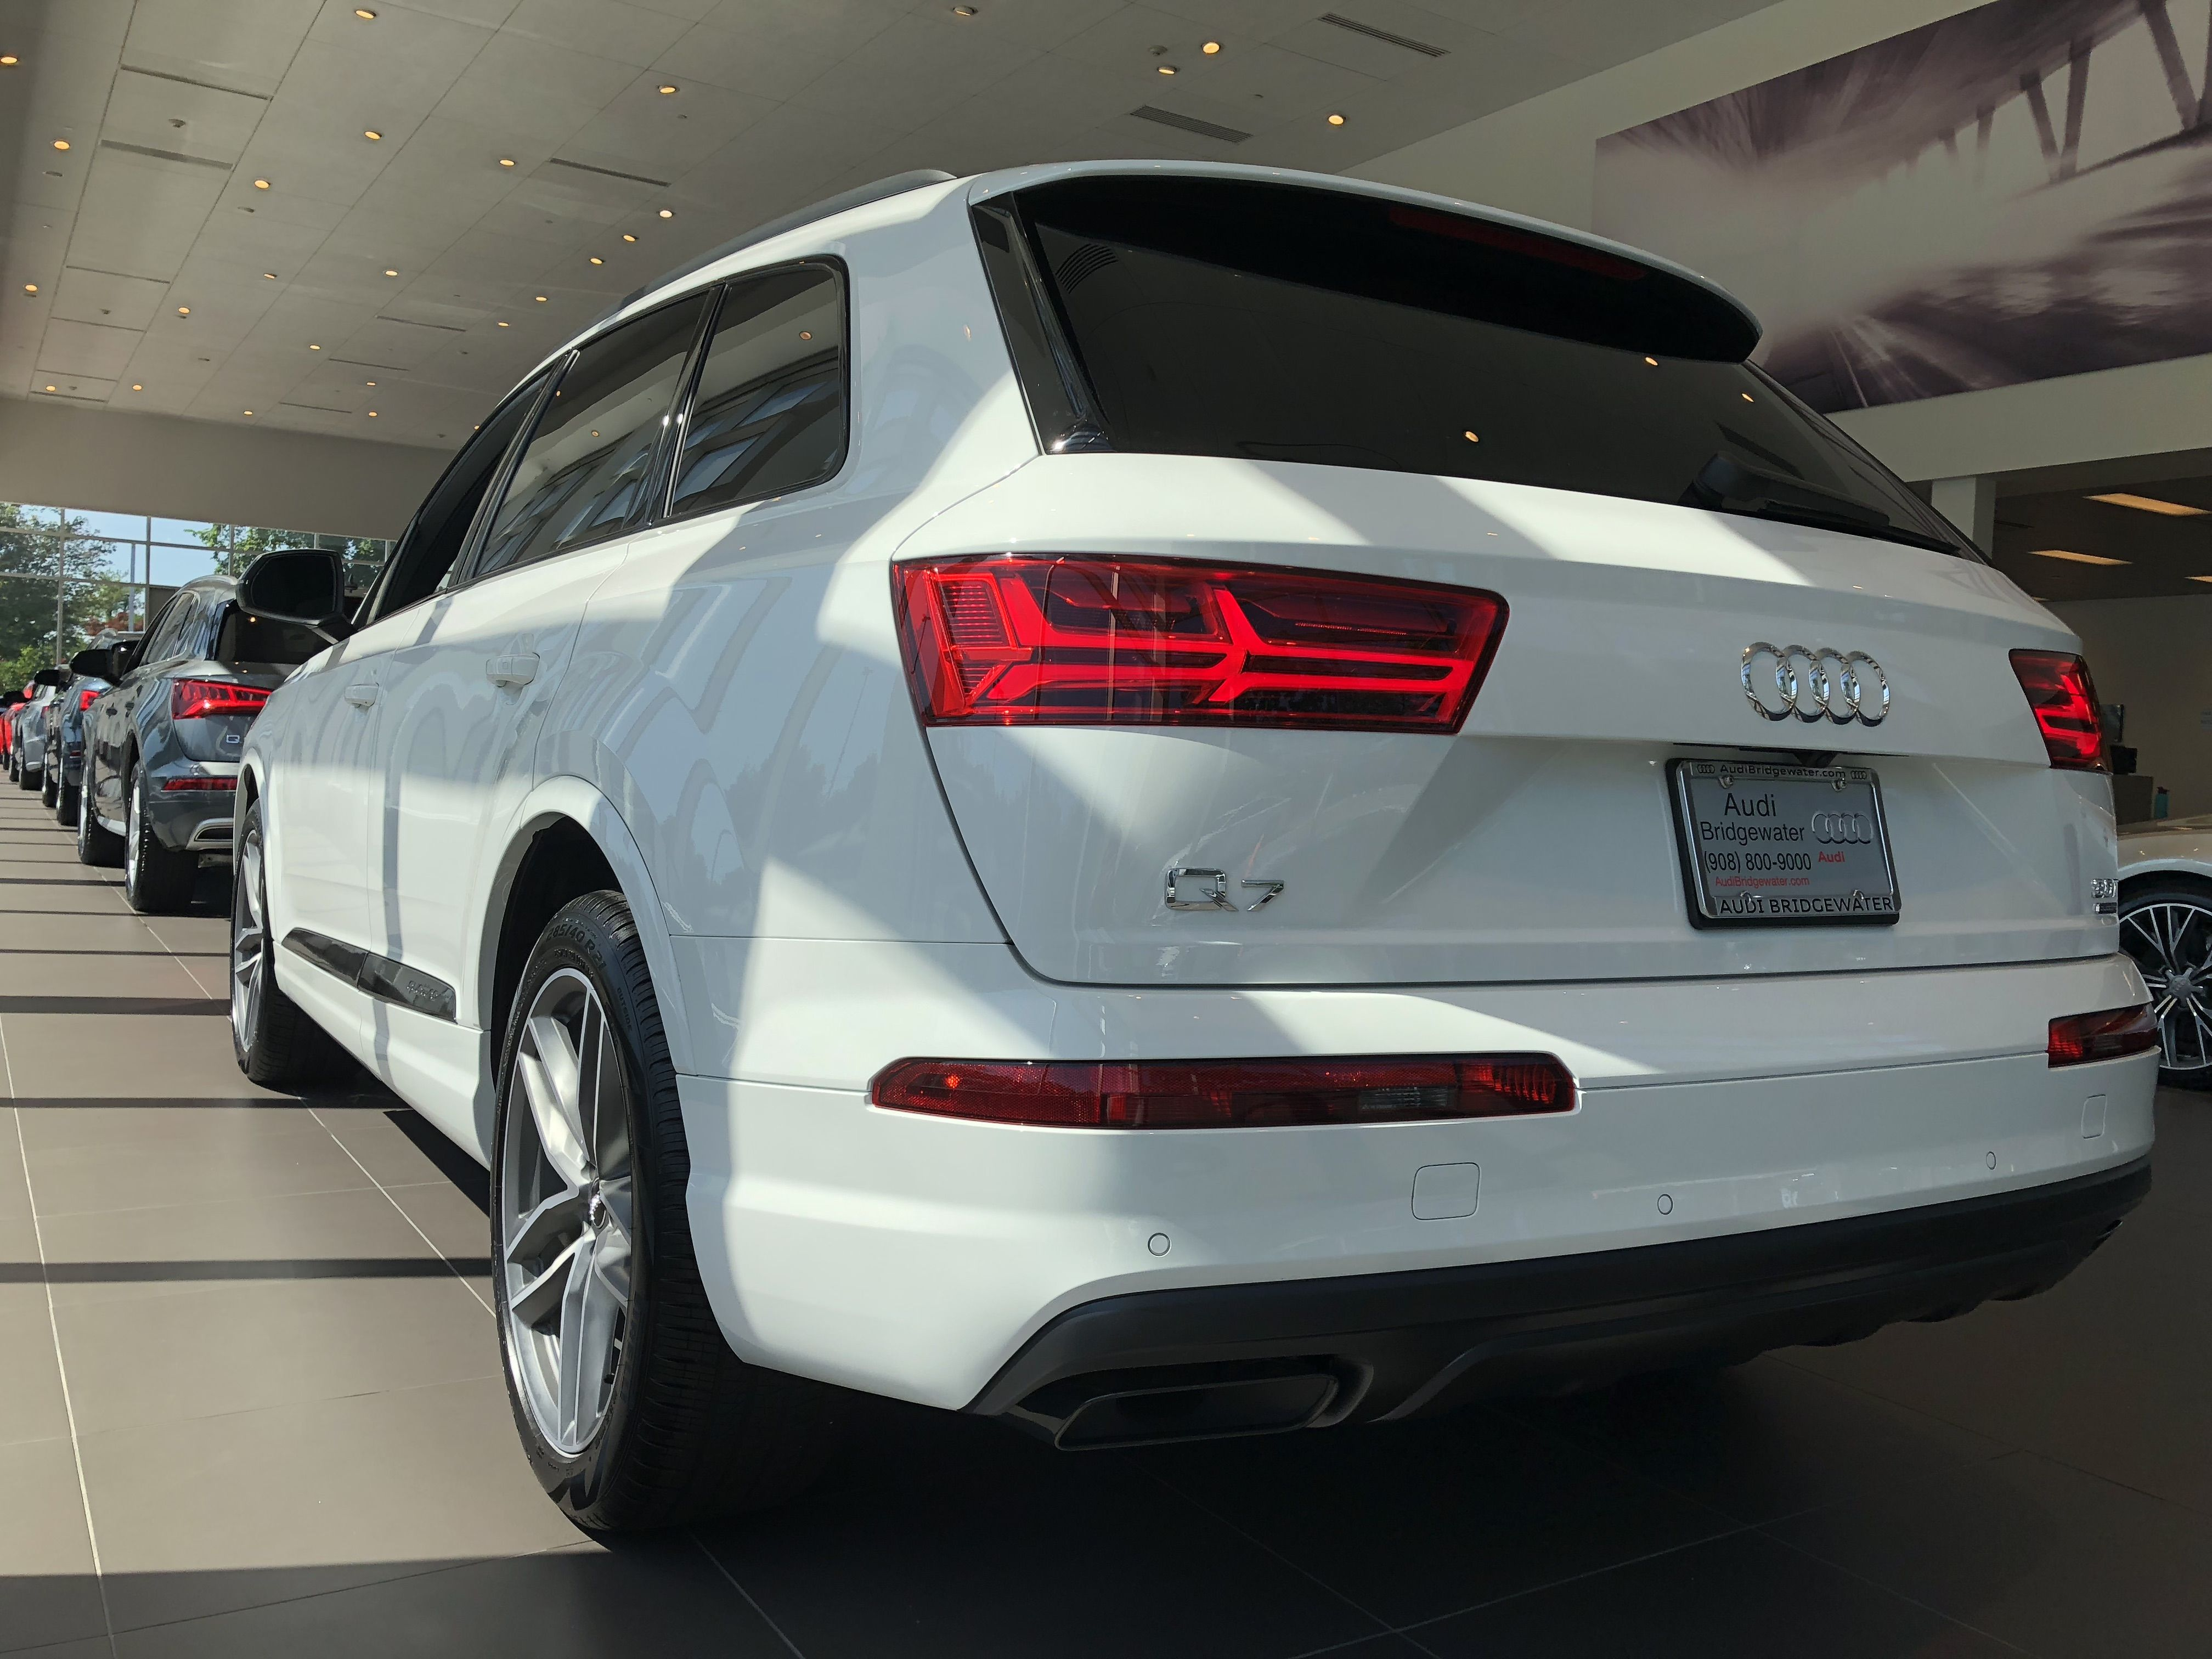 Rear Angled View Of The 2018 Audi Q7 In Carrara White Vehicle Available At Audi Of Bridgewater Nj Audi Dealership Audi Q7 Audi Q7 White